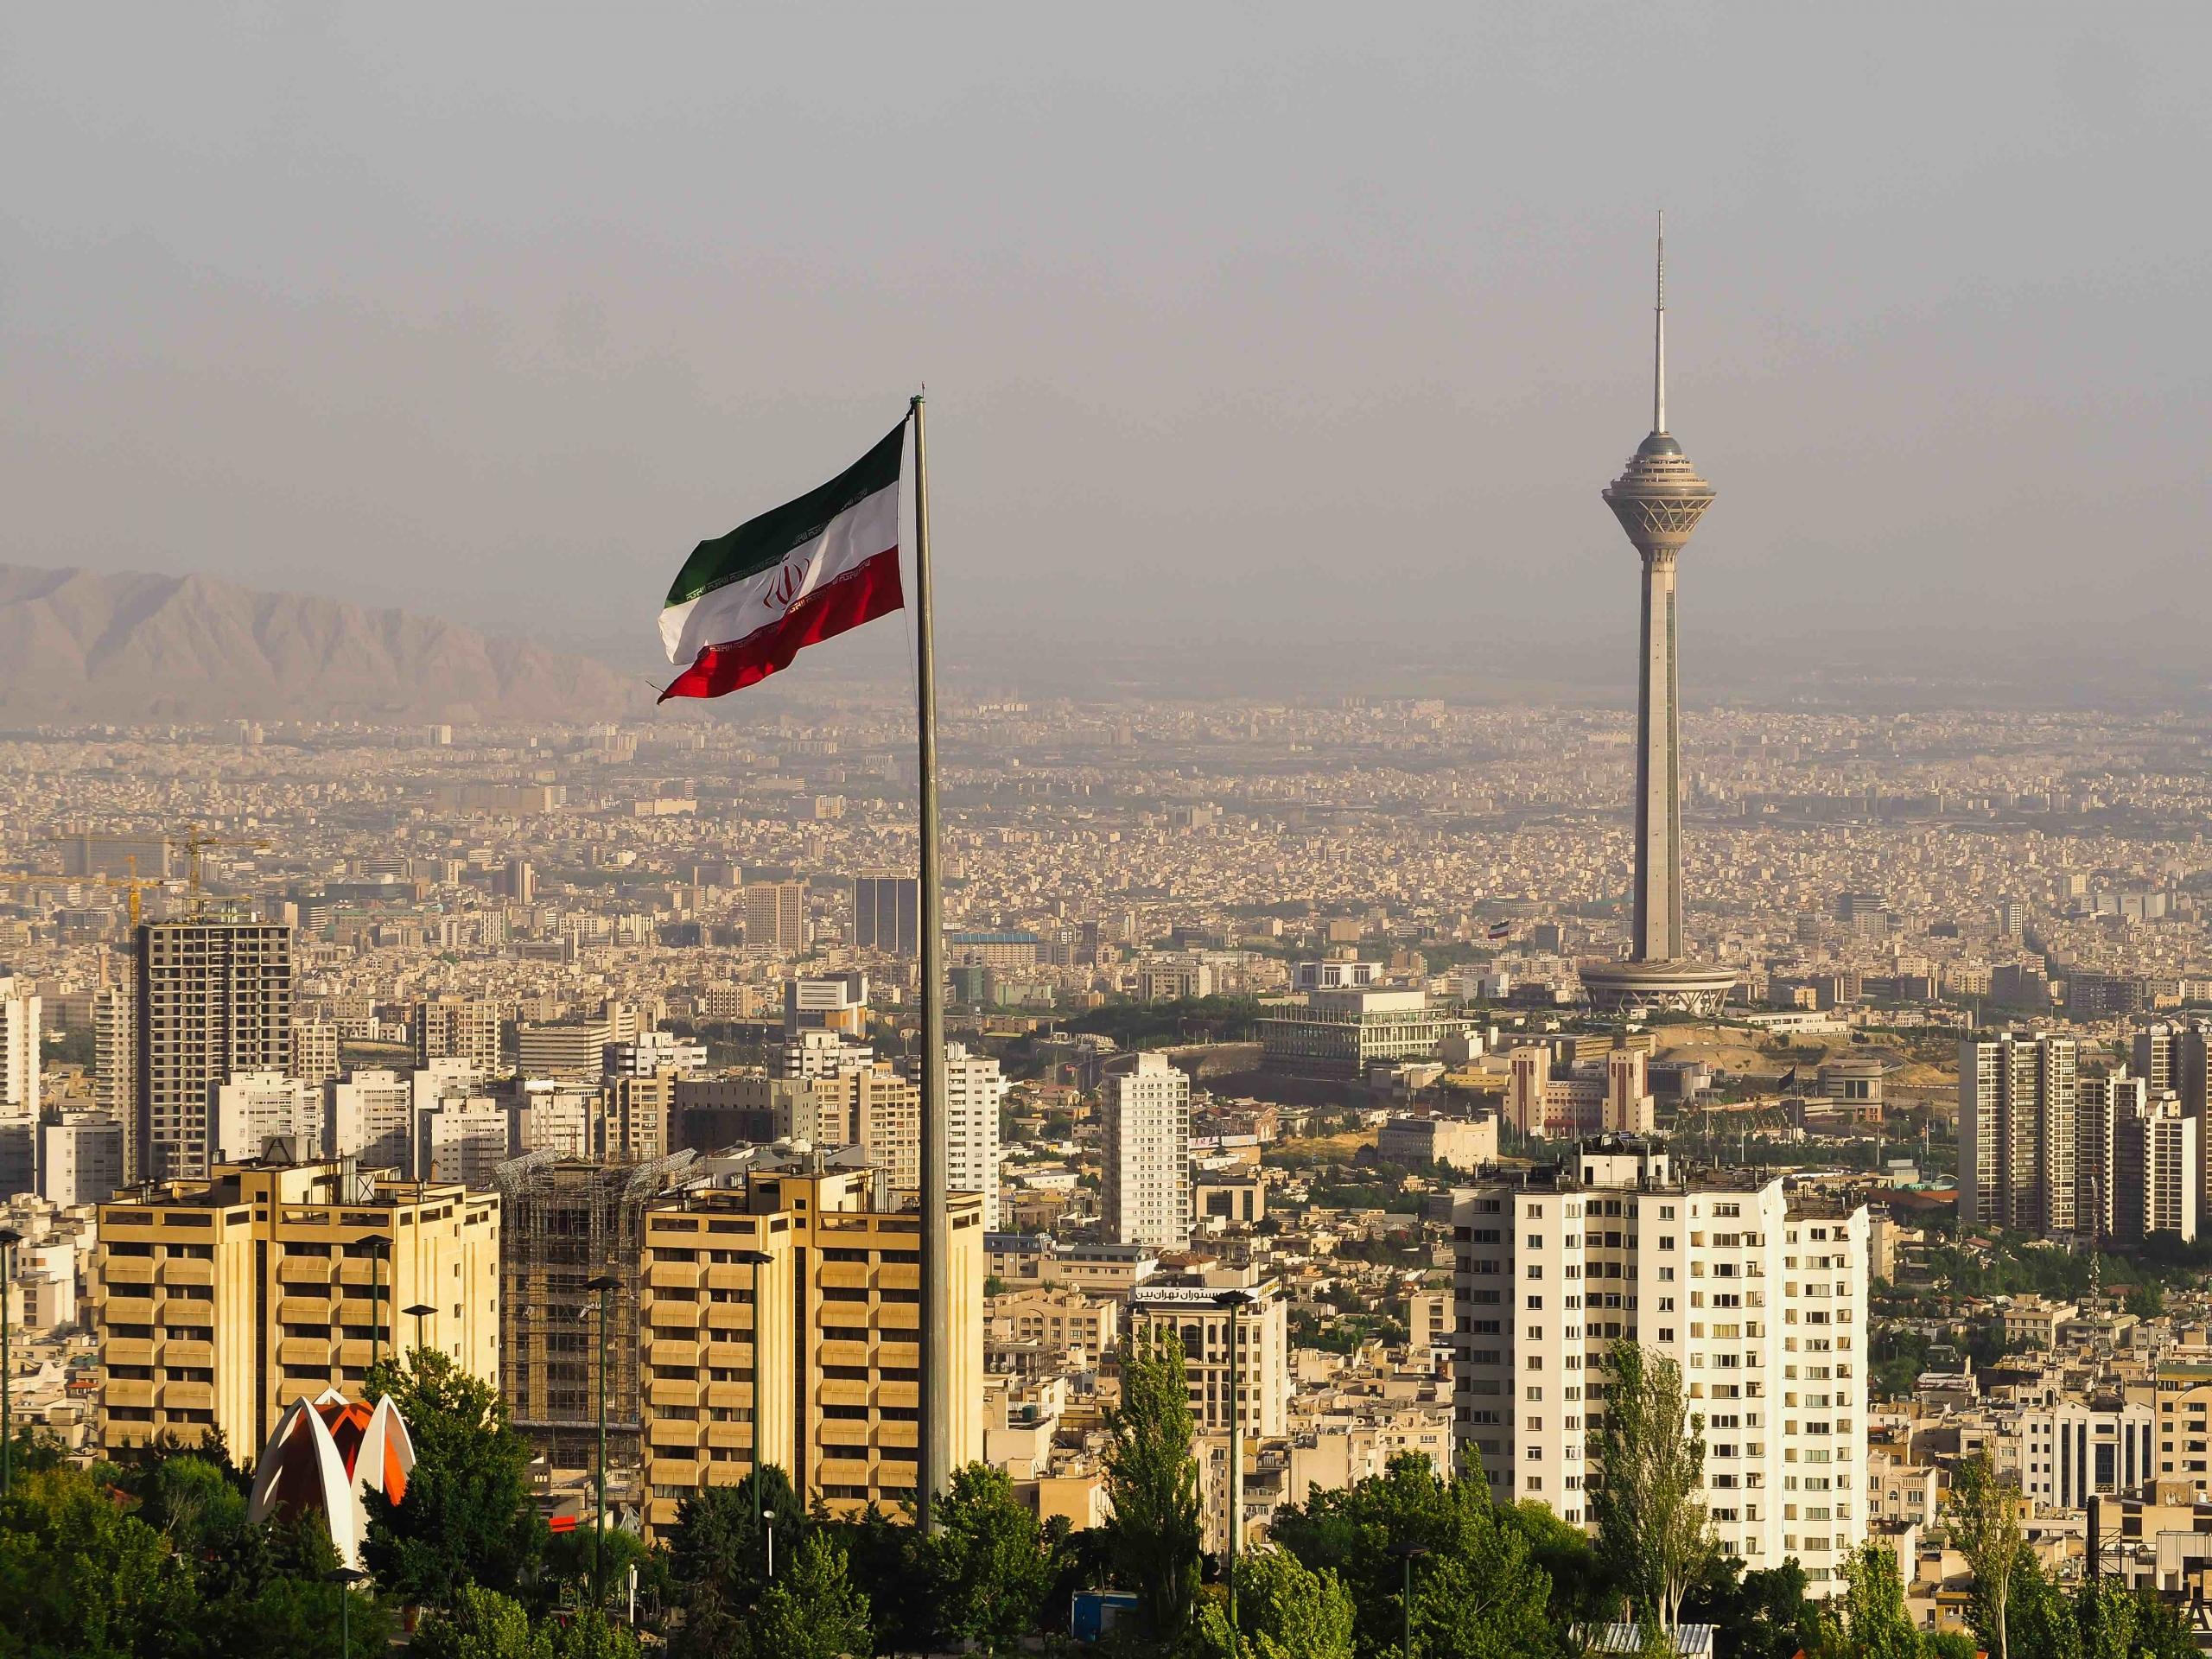 shutterstock 1415273714 scaled 1 - ایران لایحه ای را برای متمرکز کردن و قانون استفاده از رمزارزها آماده می کند